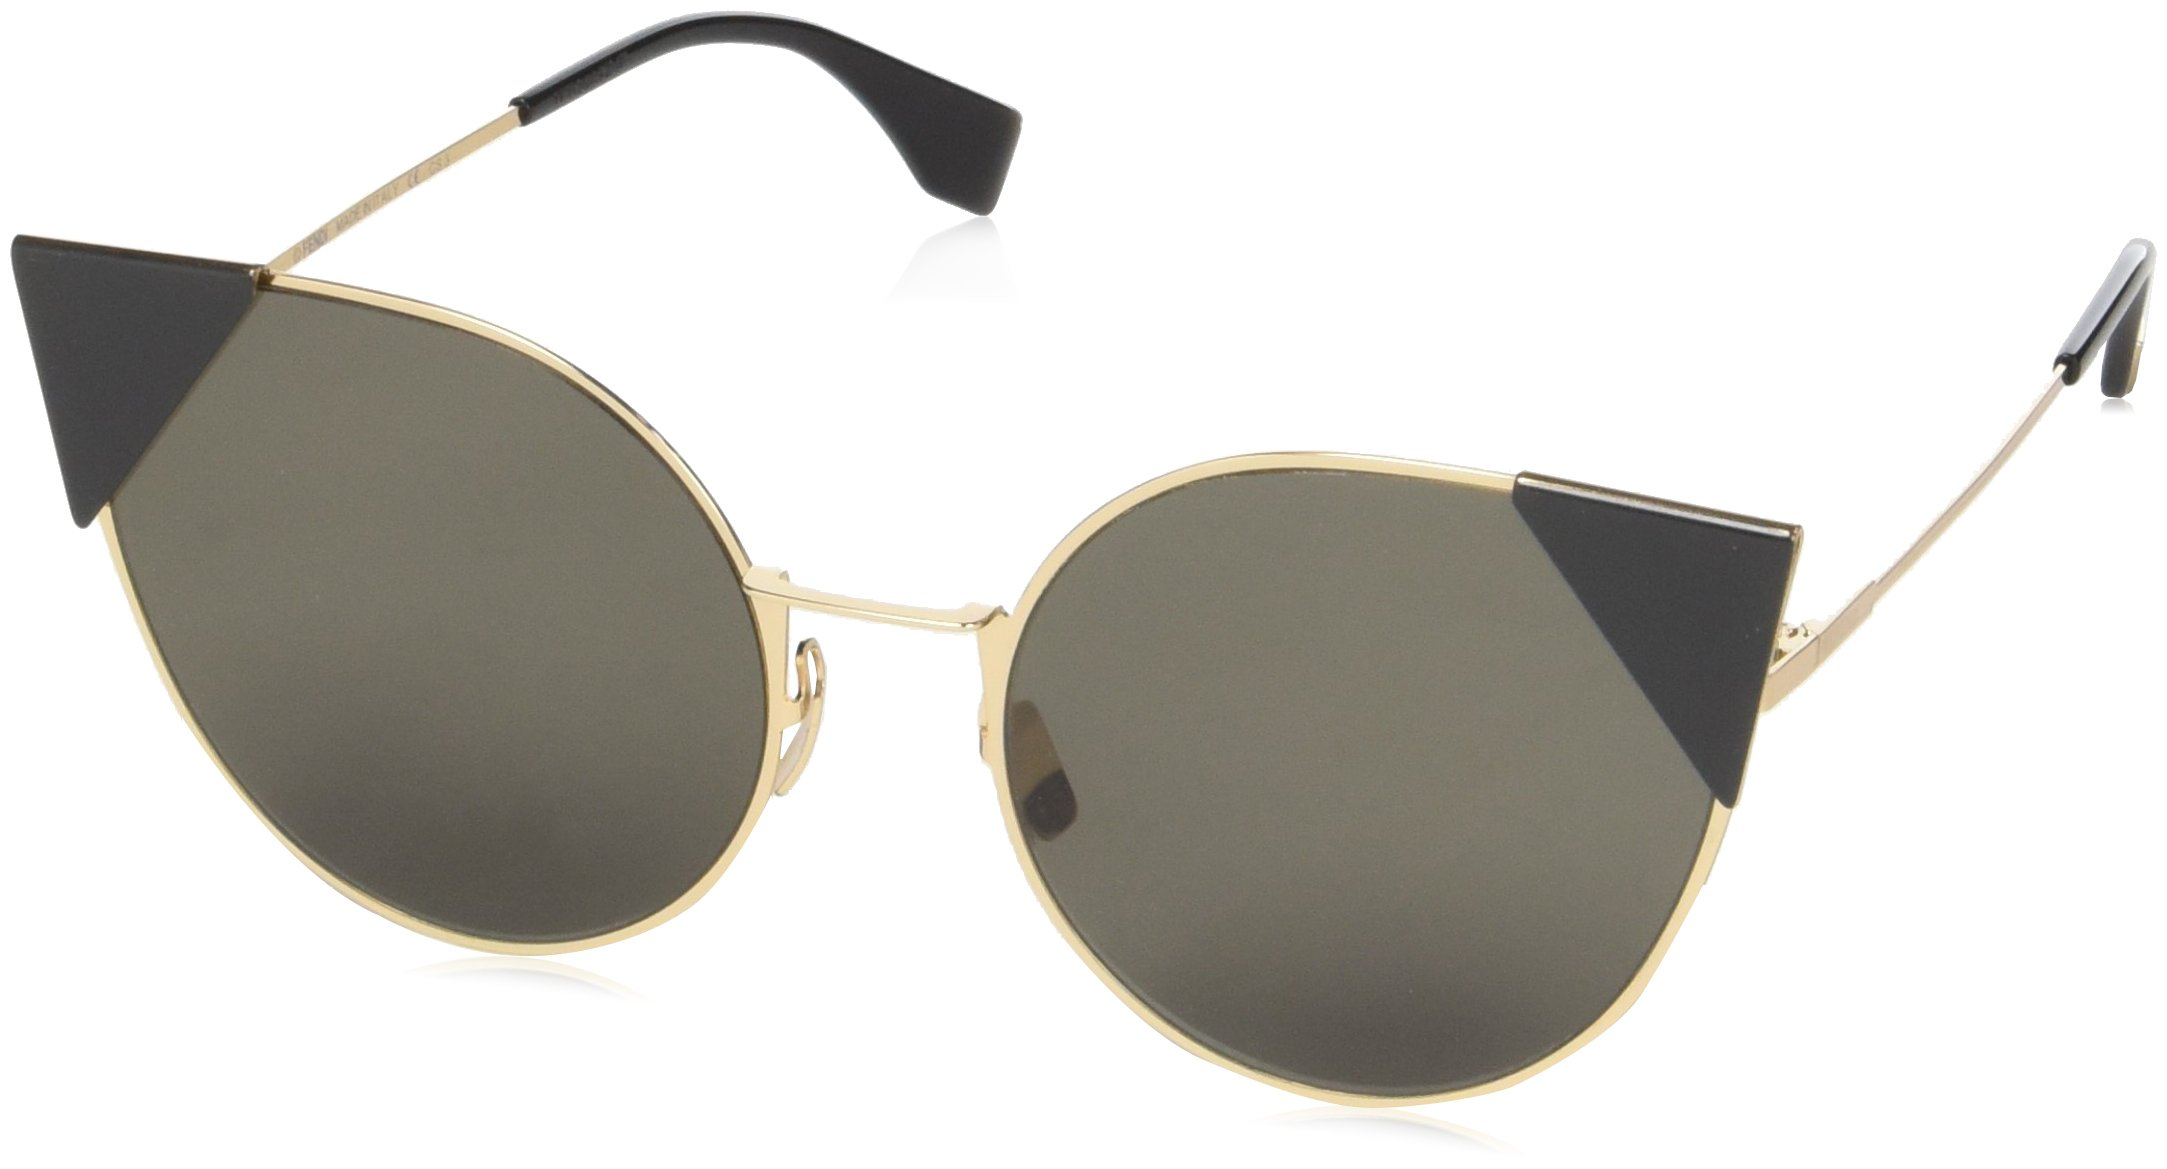 Fendi Women's Arrow Accent Sunglasses, Rose Gold Black/Black, One Size